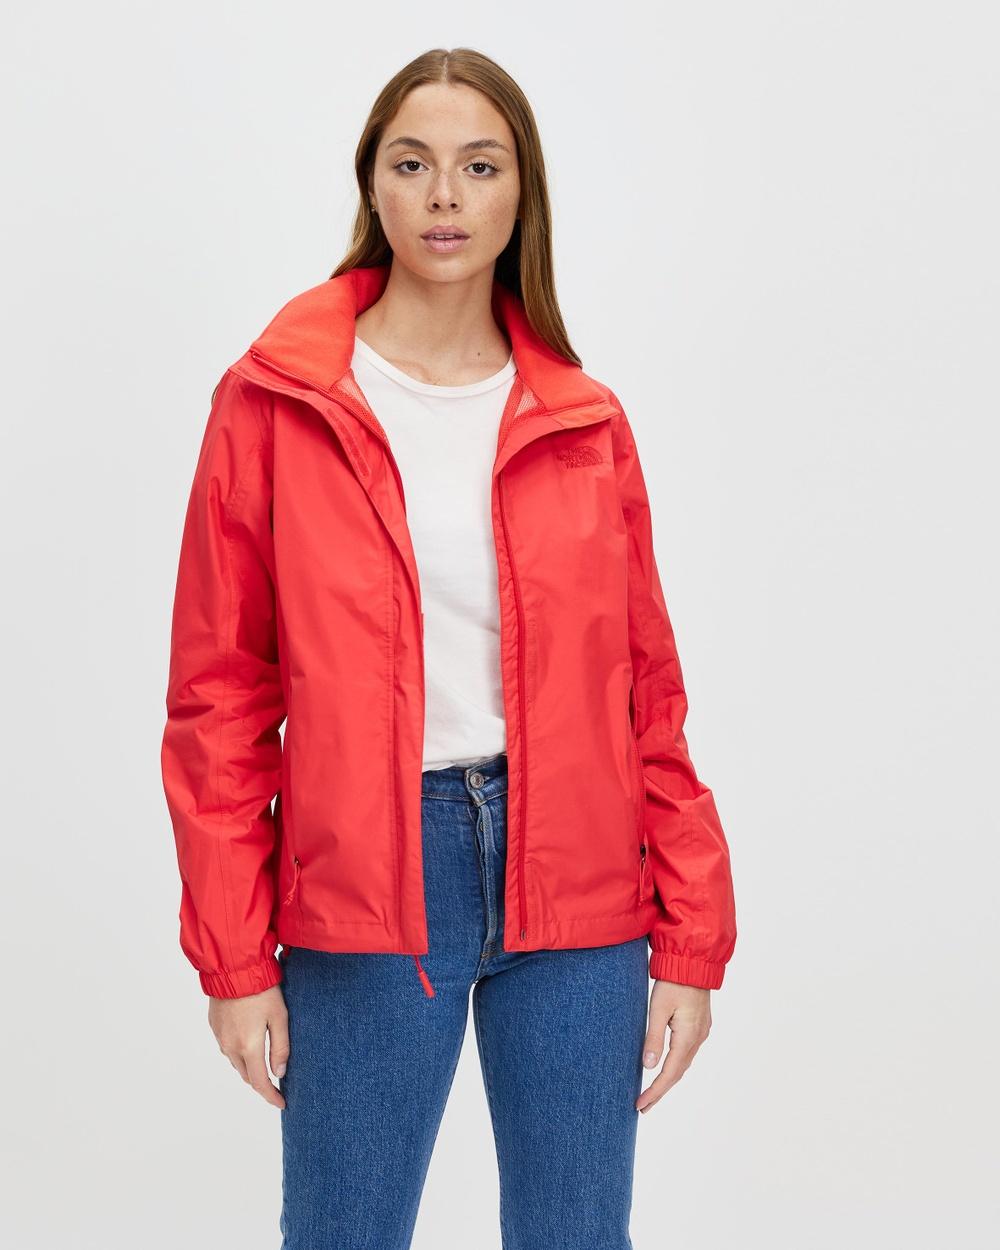 The North Face Resolve 2 Jacket Coats & Jackets Hazard Red